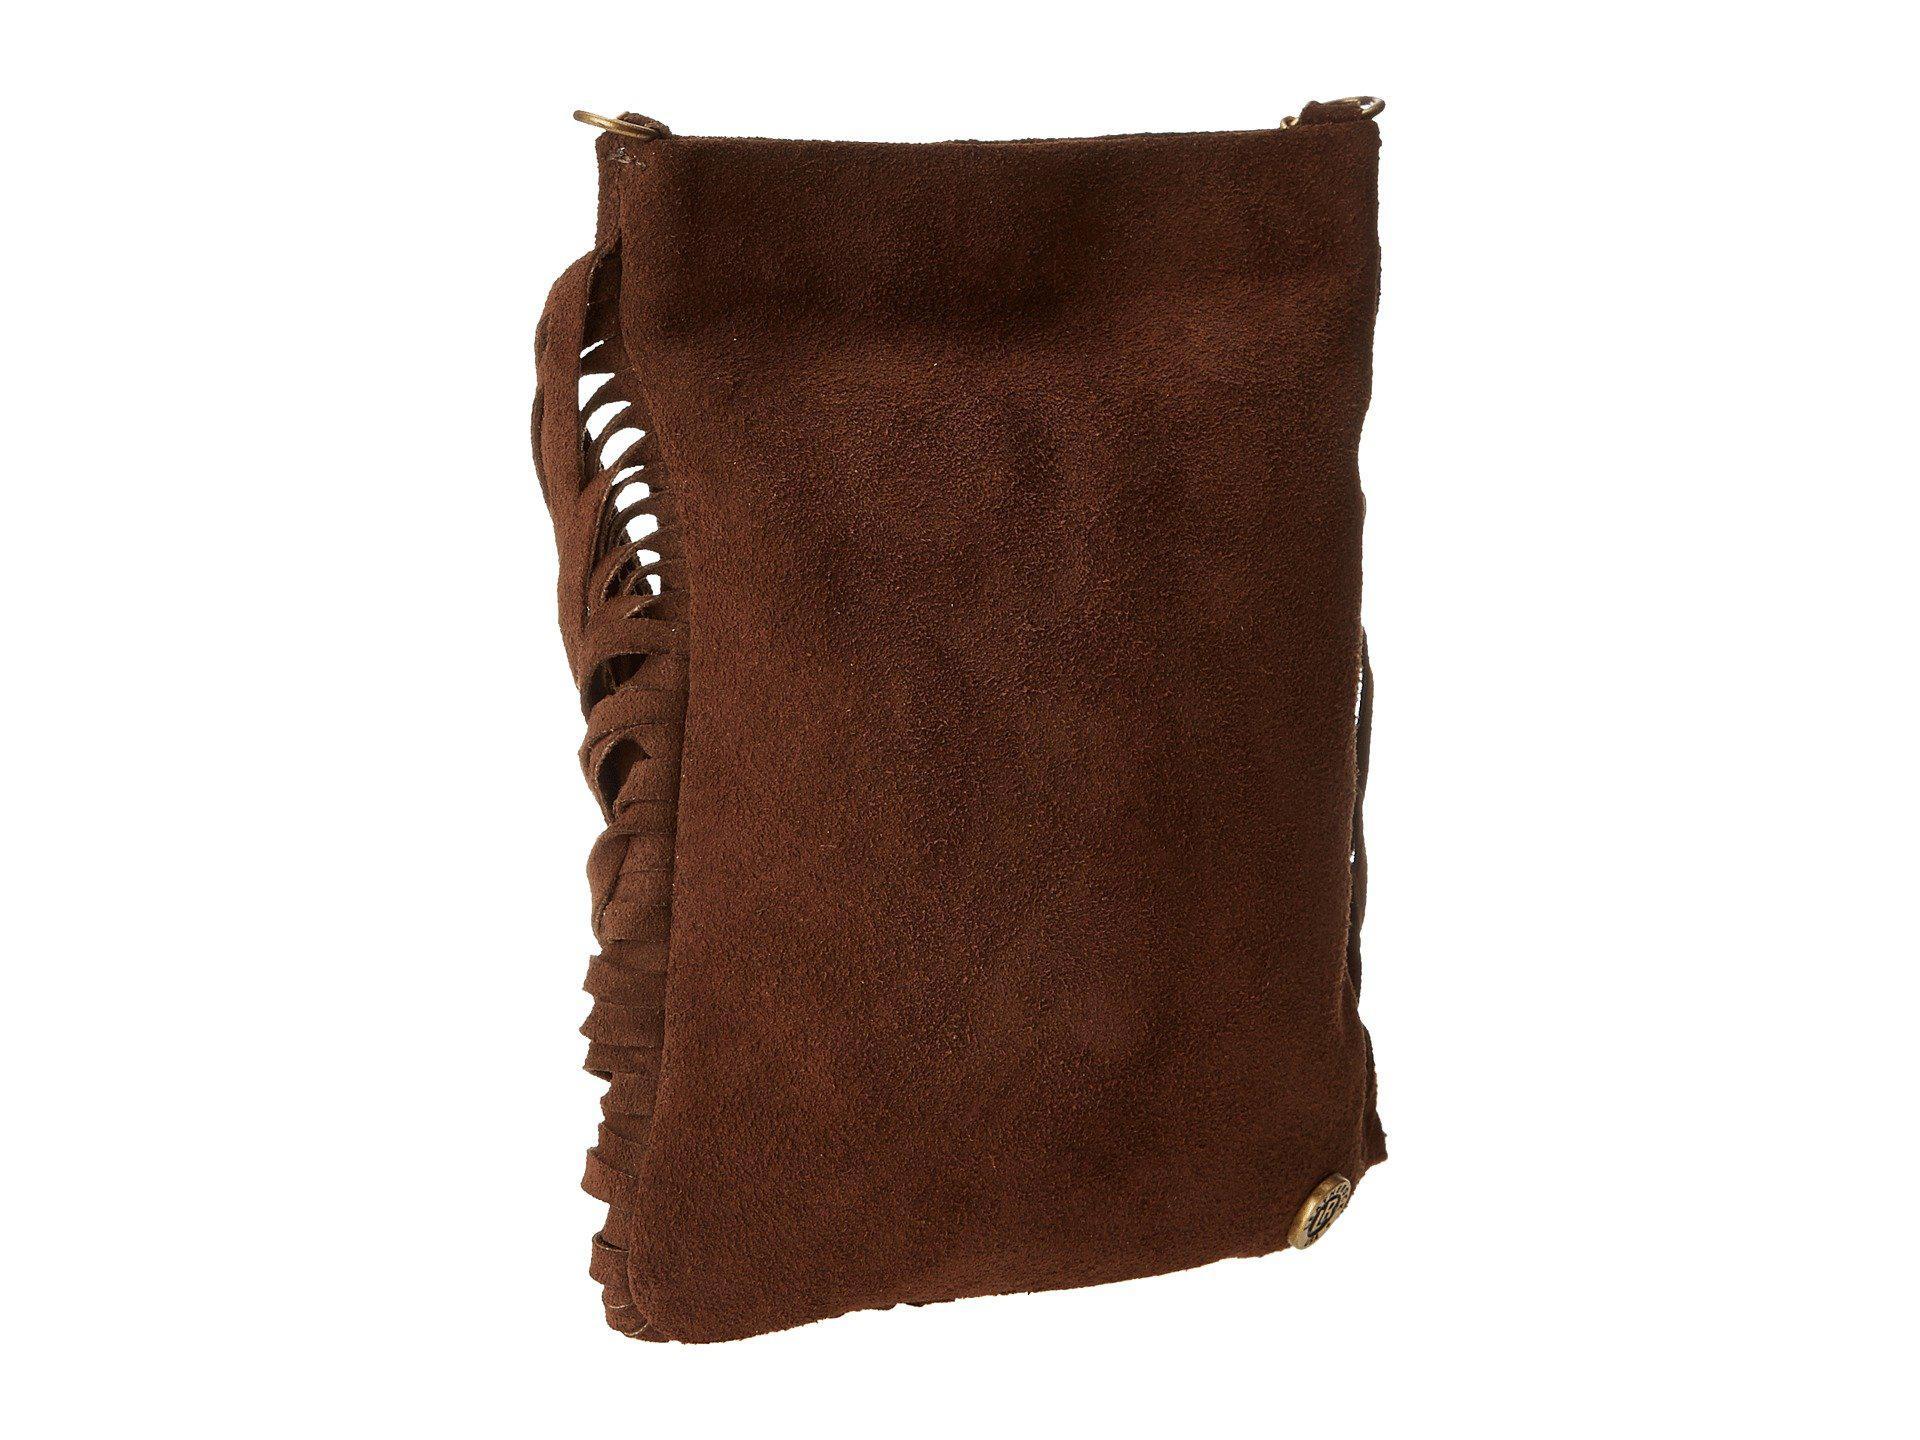 Leatherock CP59 (Split Brown/Amber) Handbags DUgr67g